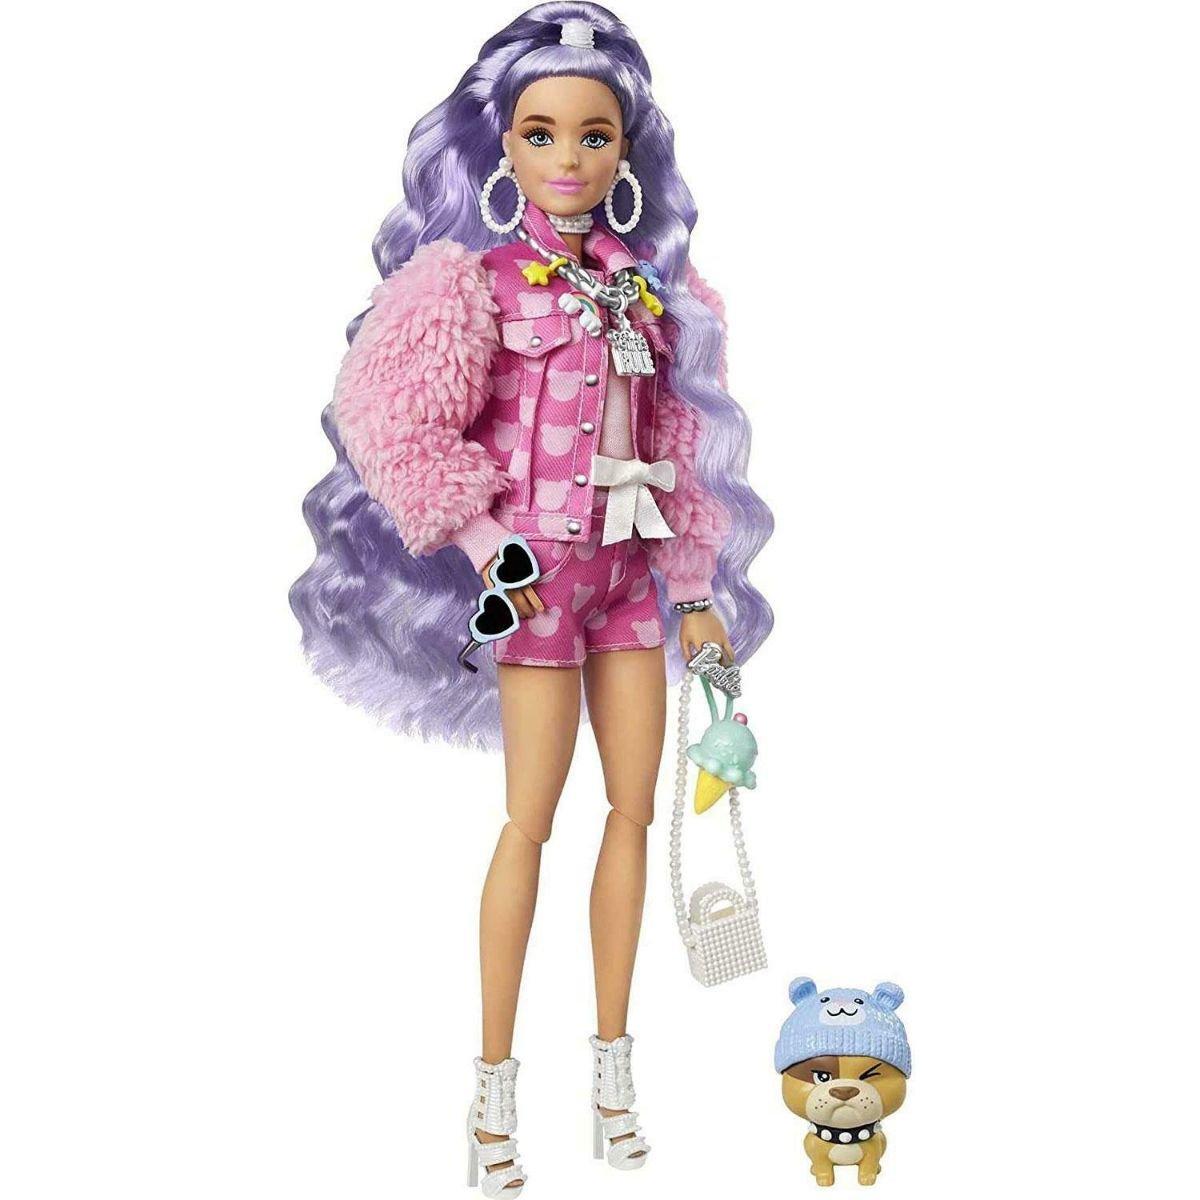 Papusa Barbie, Extra Style, Millie Prewinkle Hair